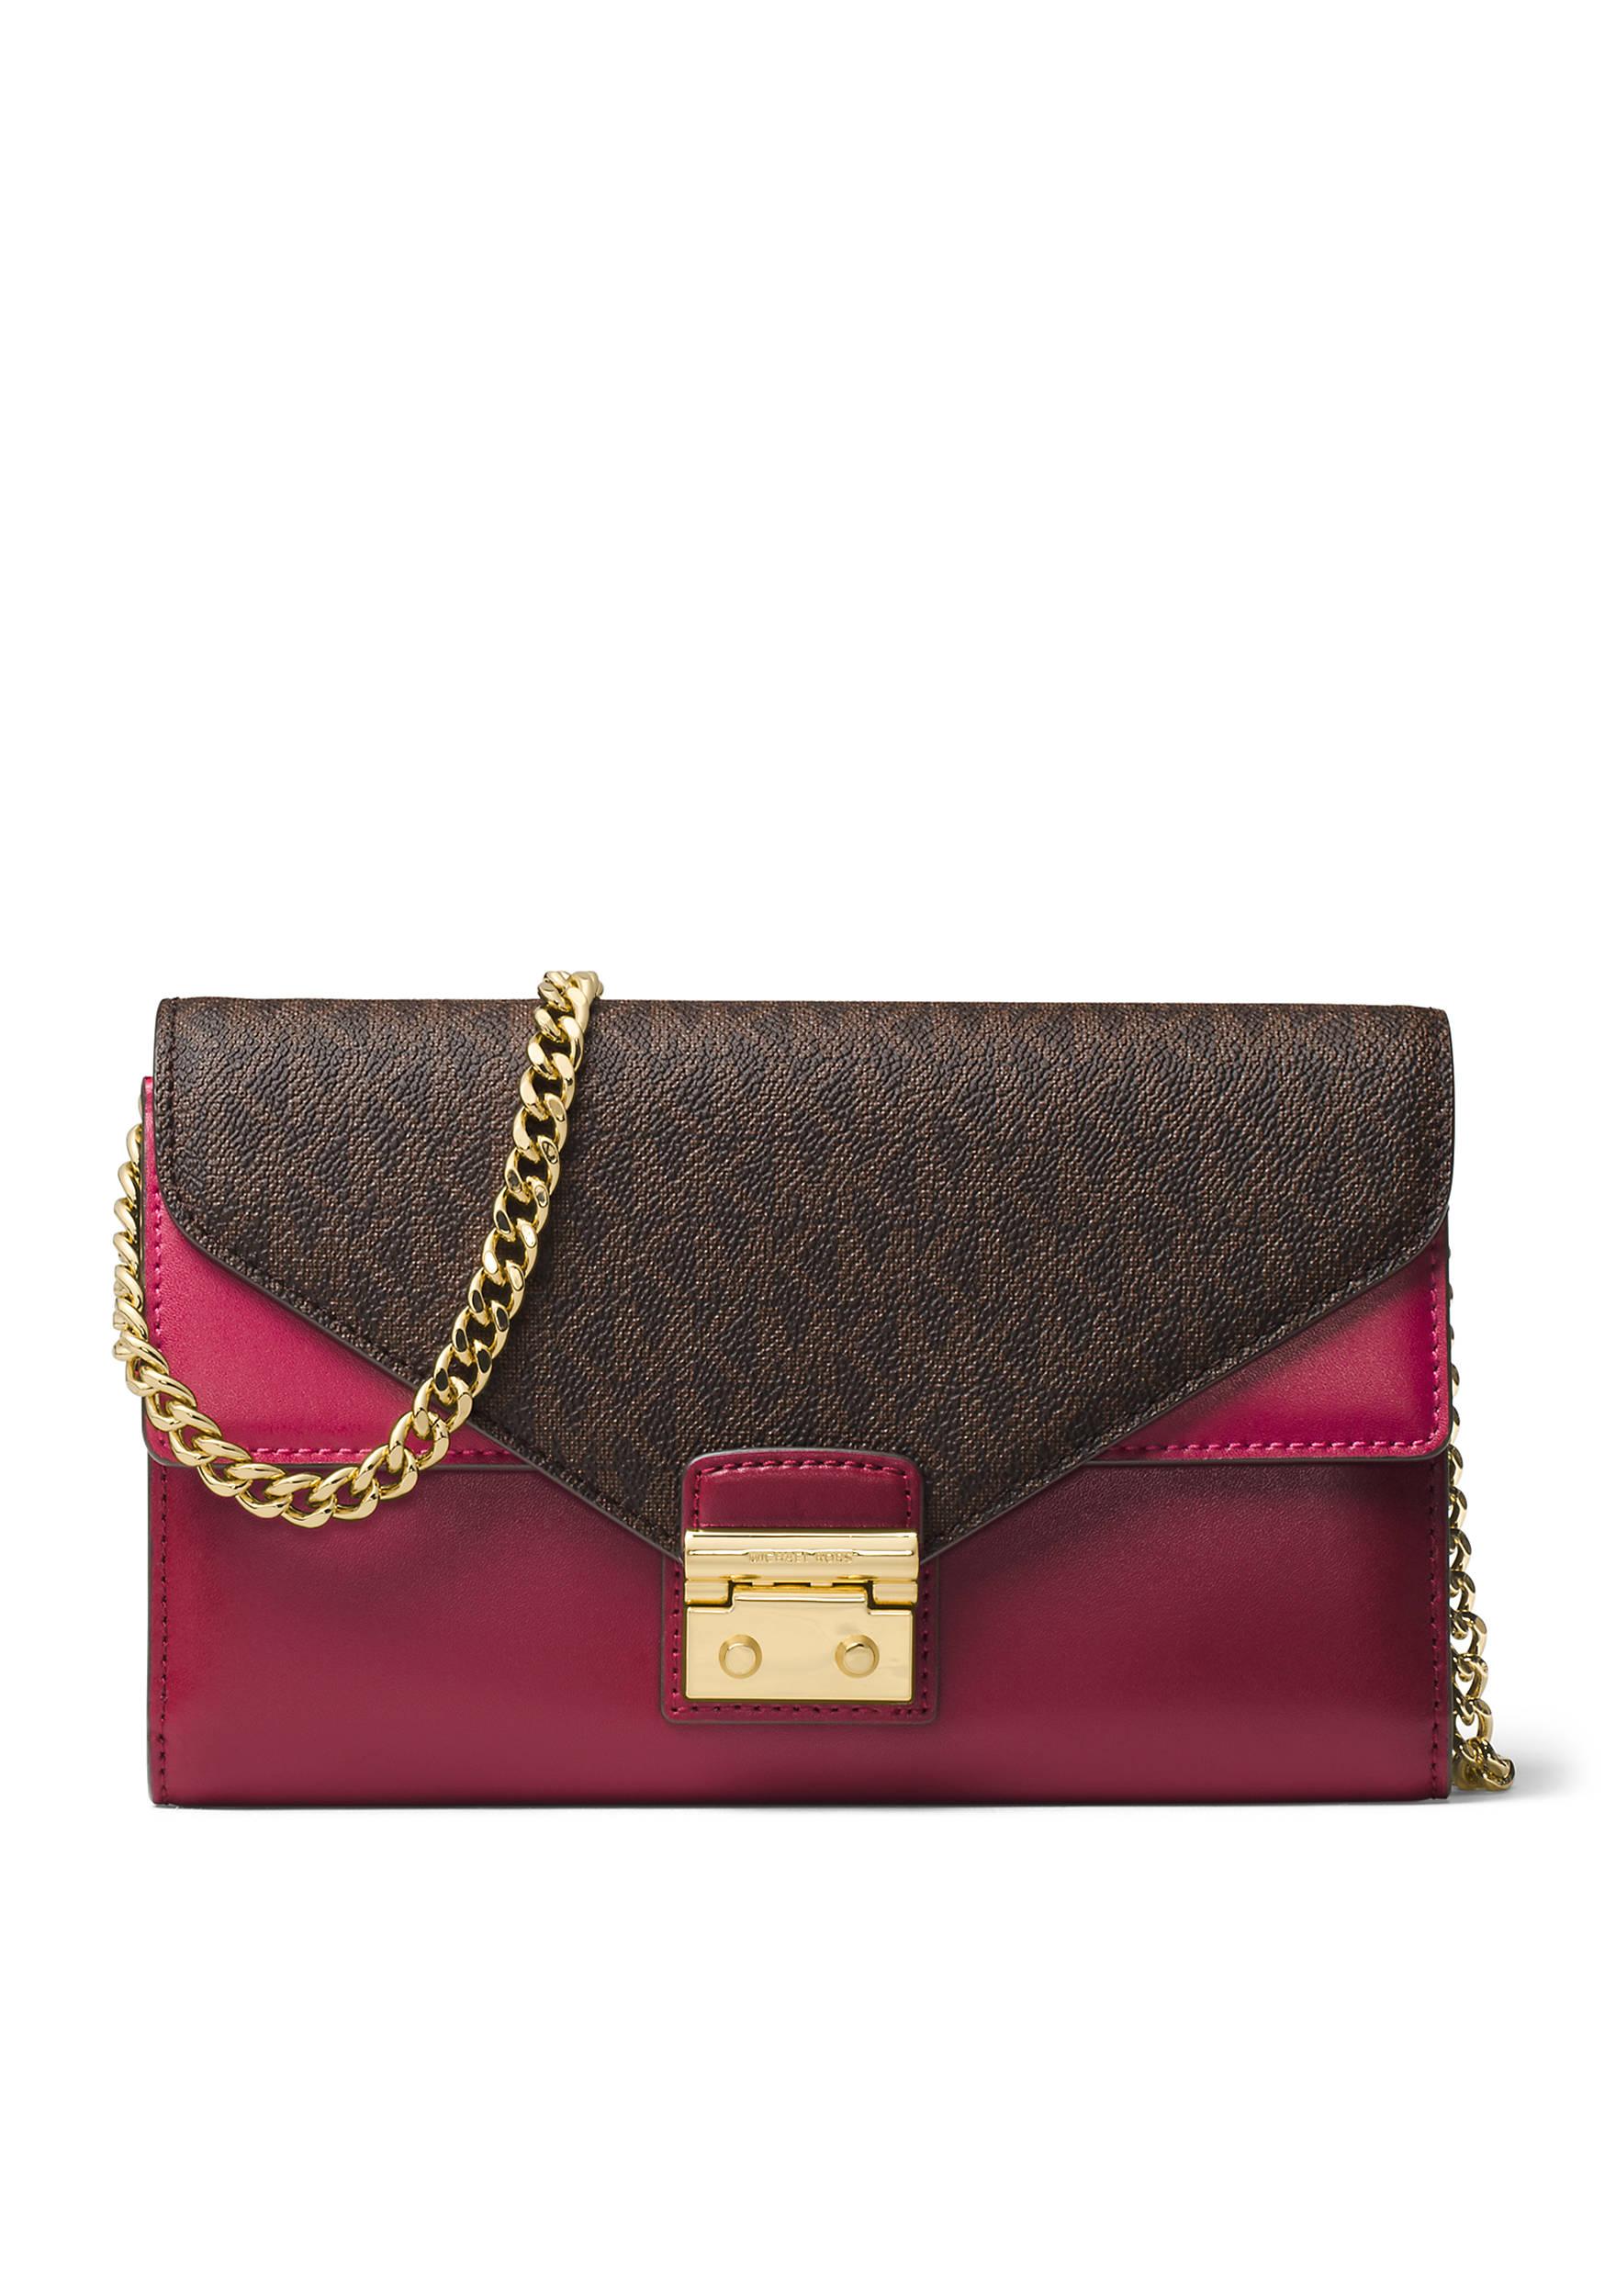 Michael Kors Handbags  belk